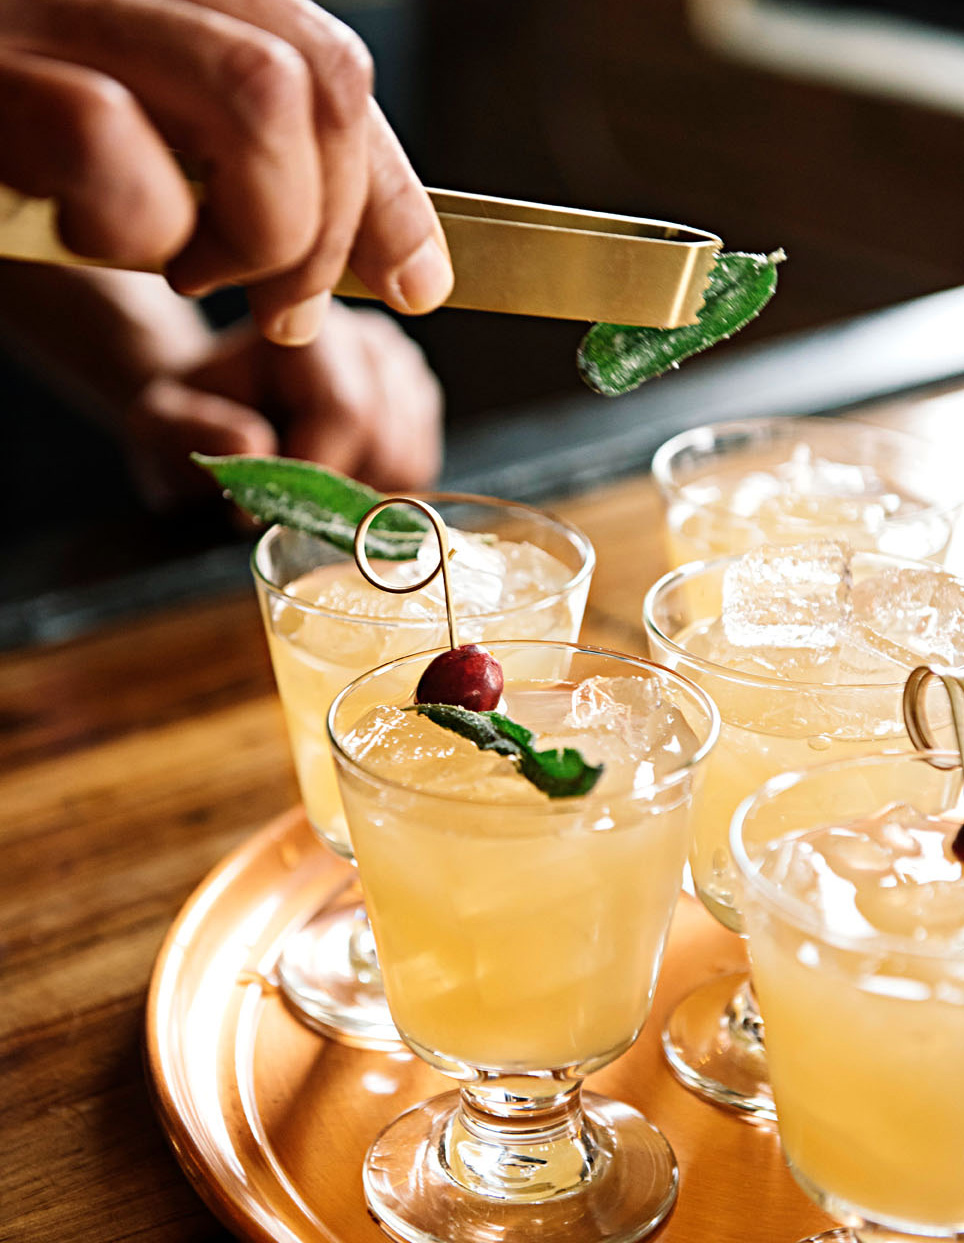 Sage woodstock cocktail